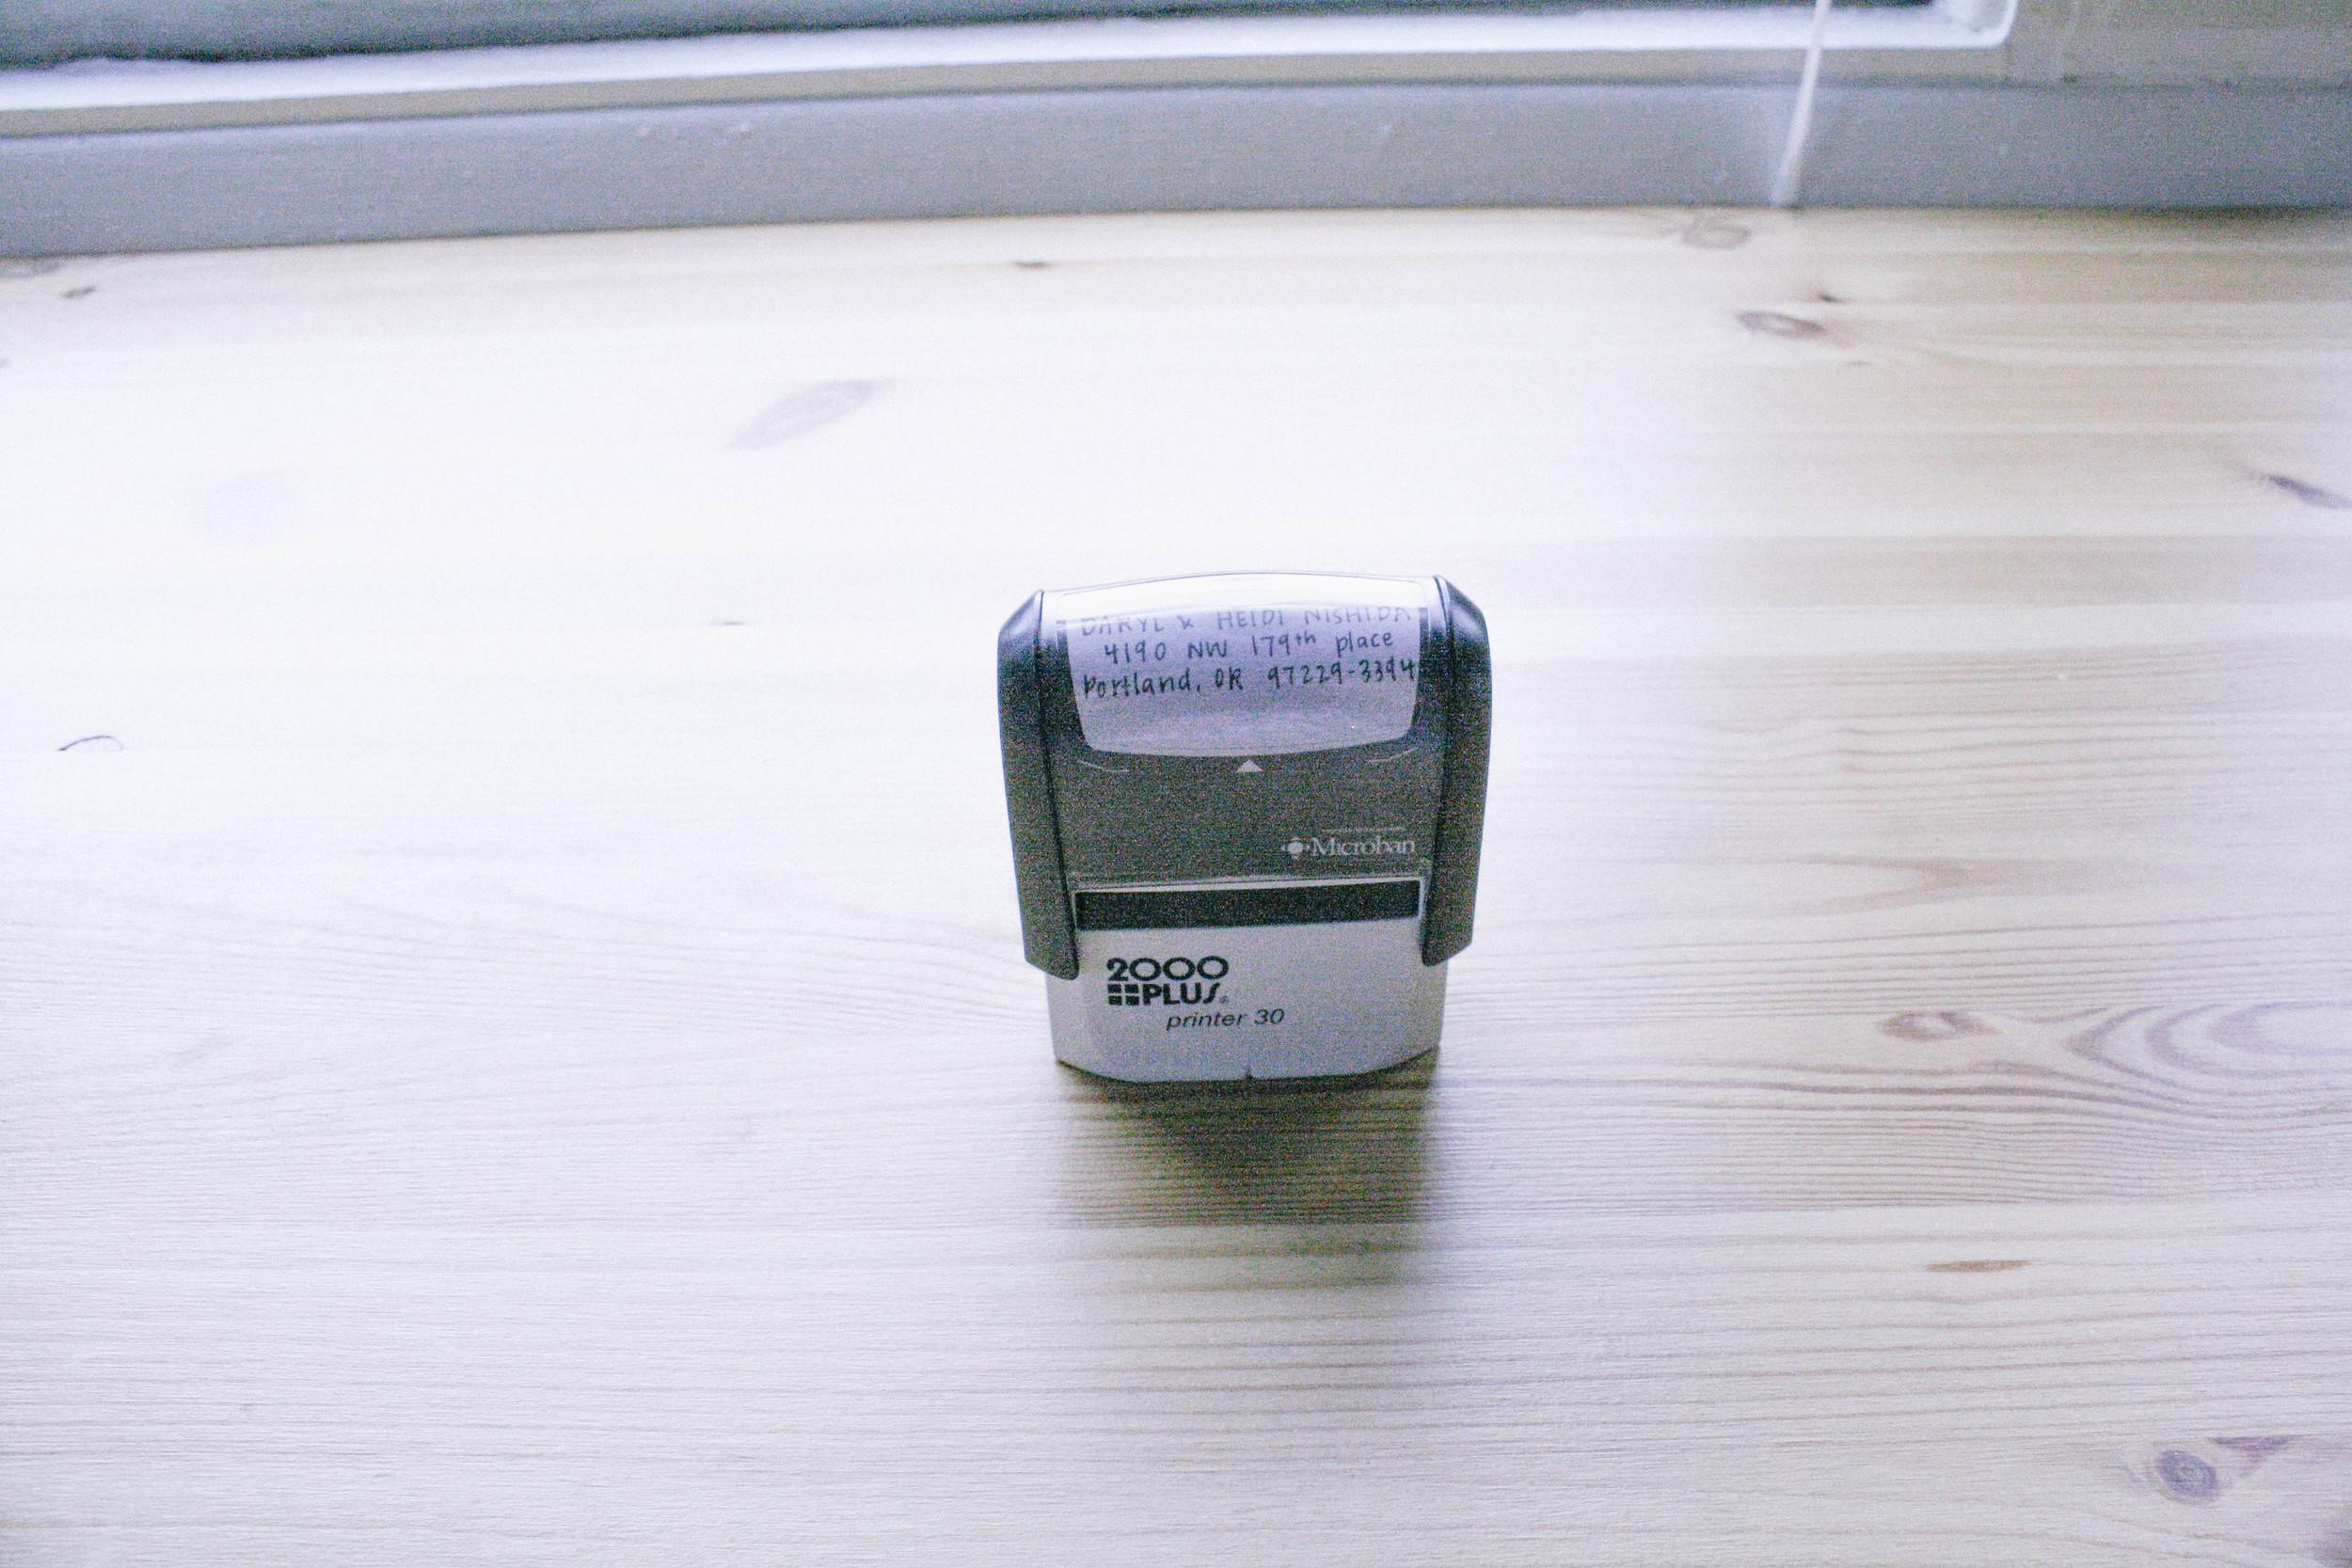 custom-address-stamp-by-everglow-handmade-2